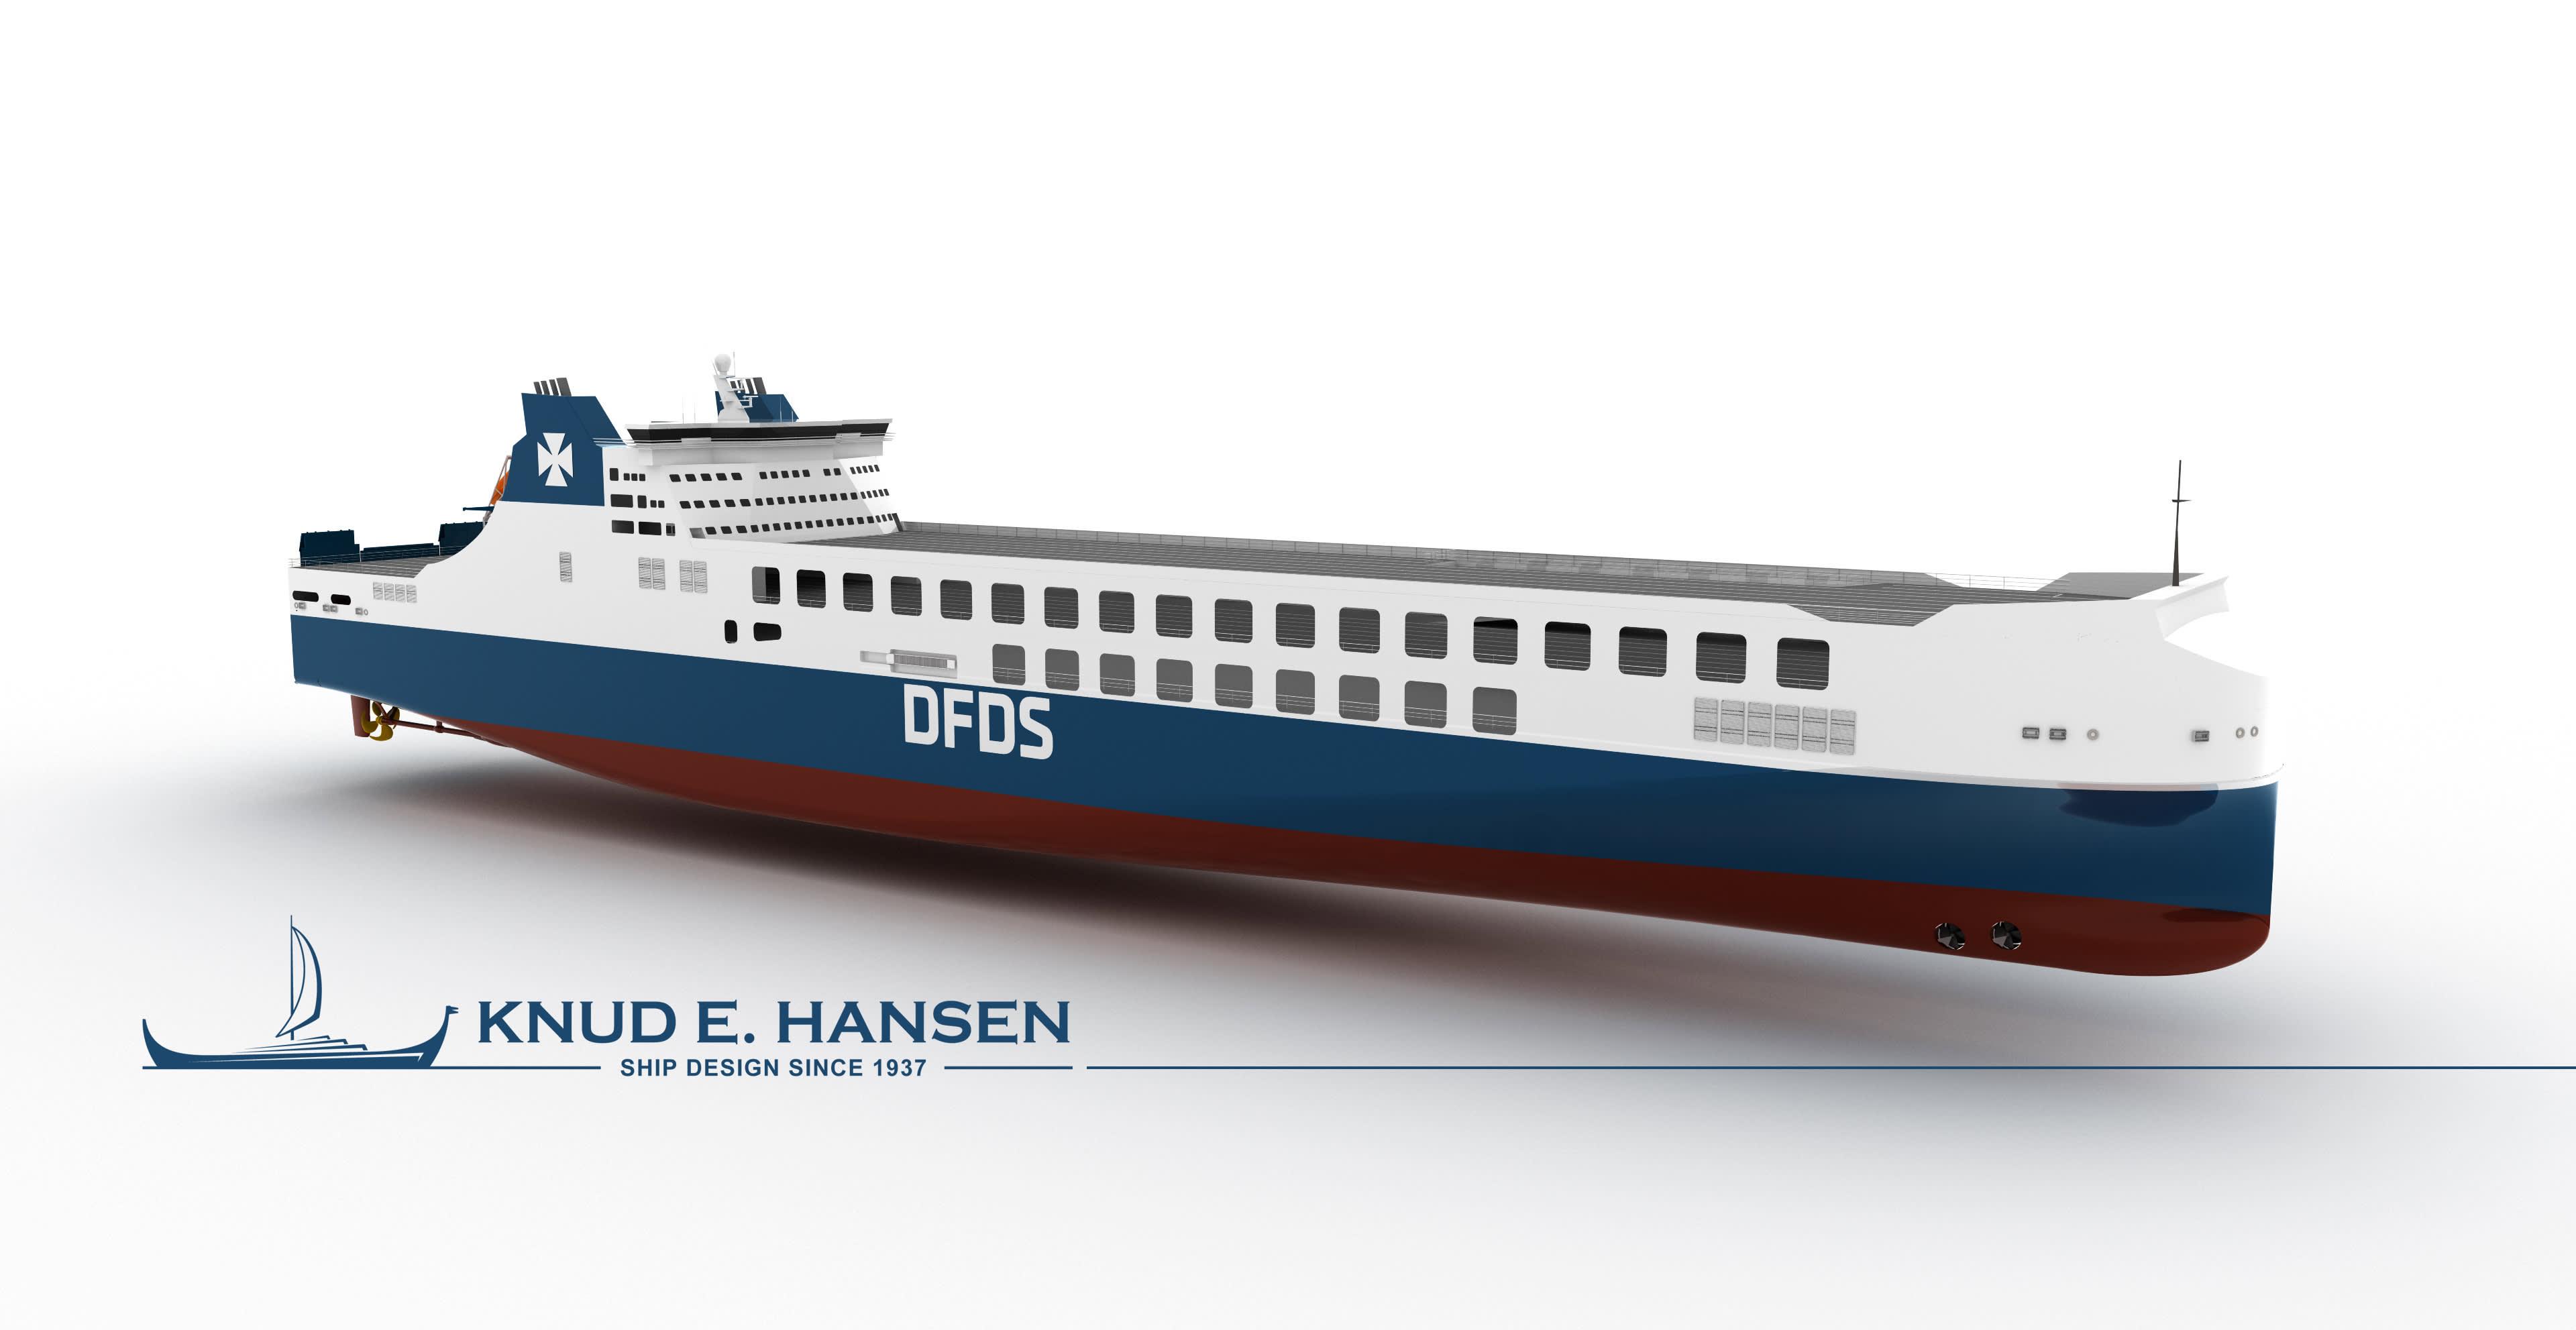 CSC Jinling Shipyard. DFDS. RoRo design by KNUD E. HANSEN 2